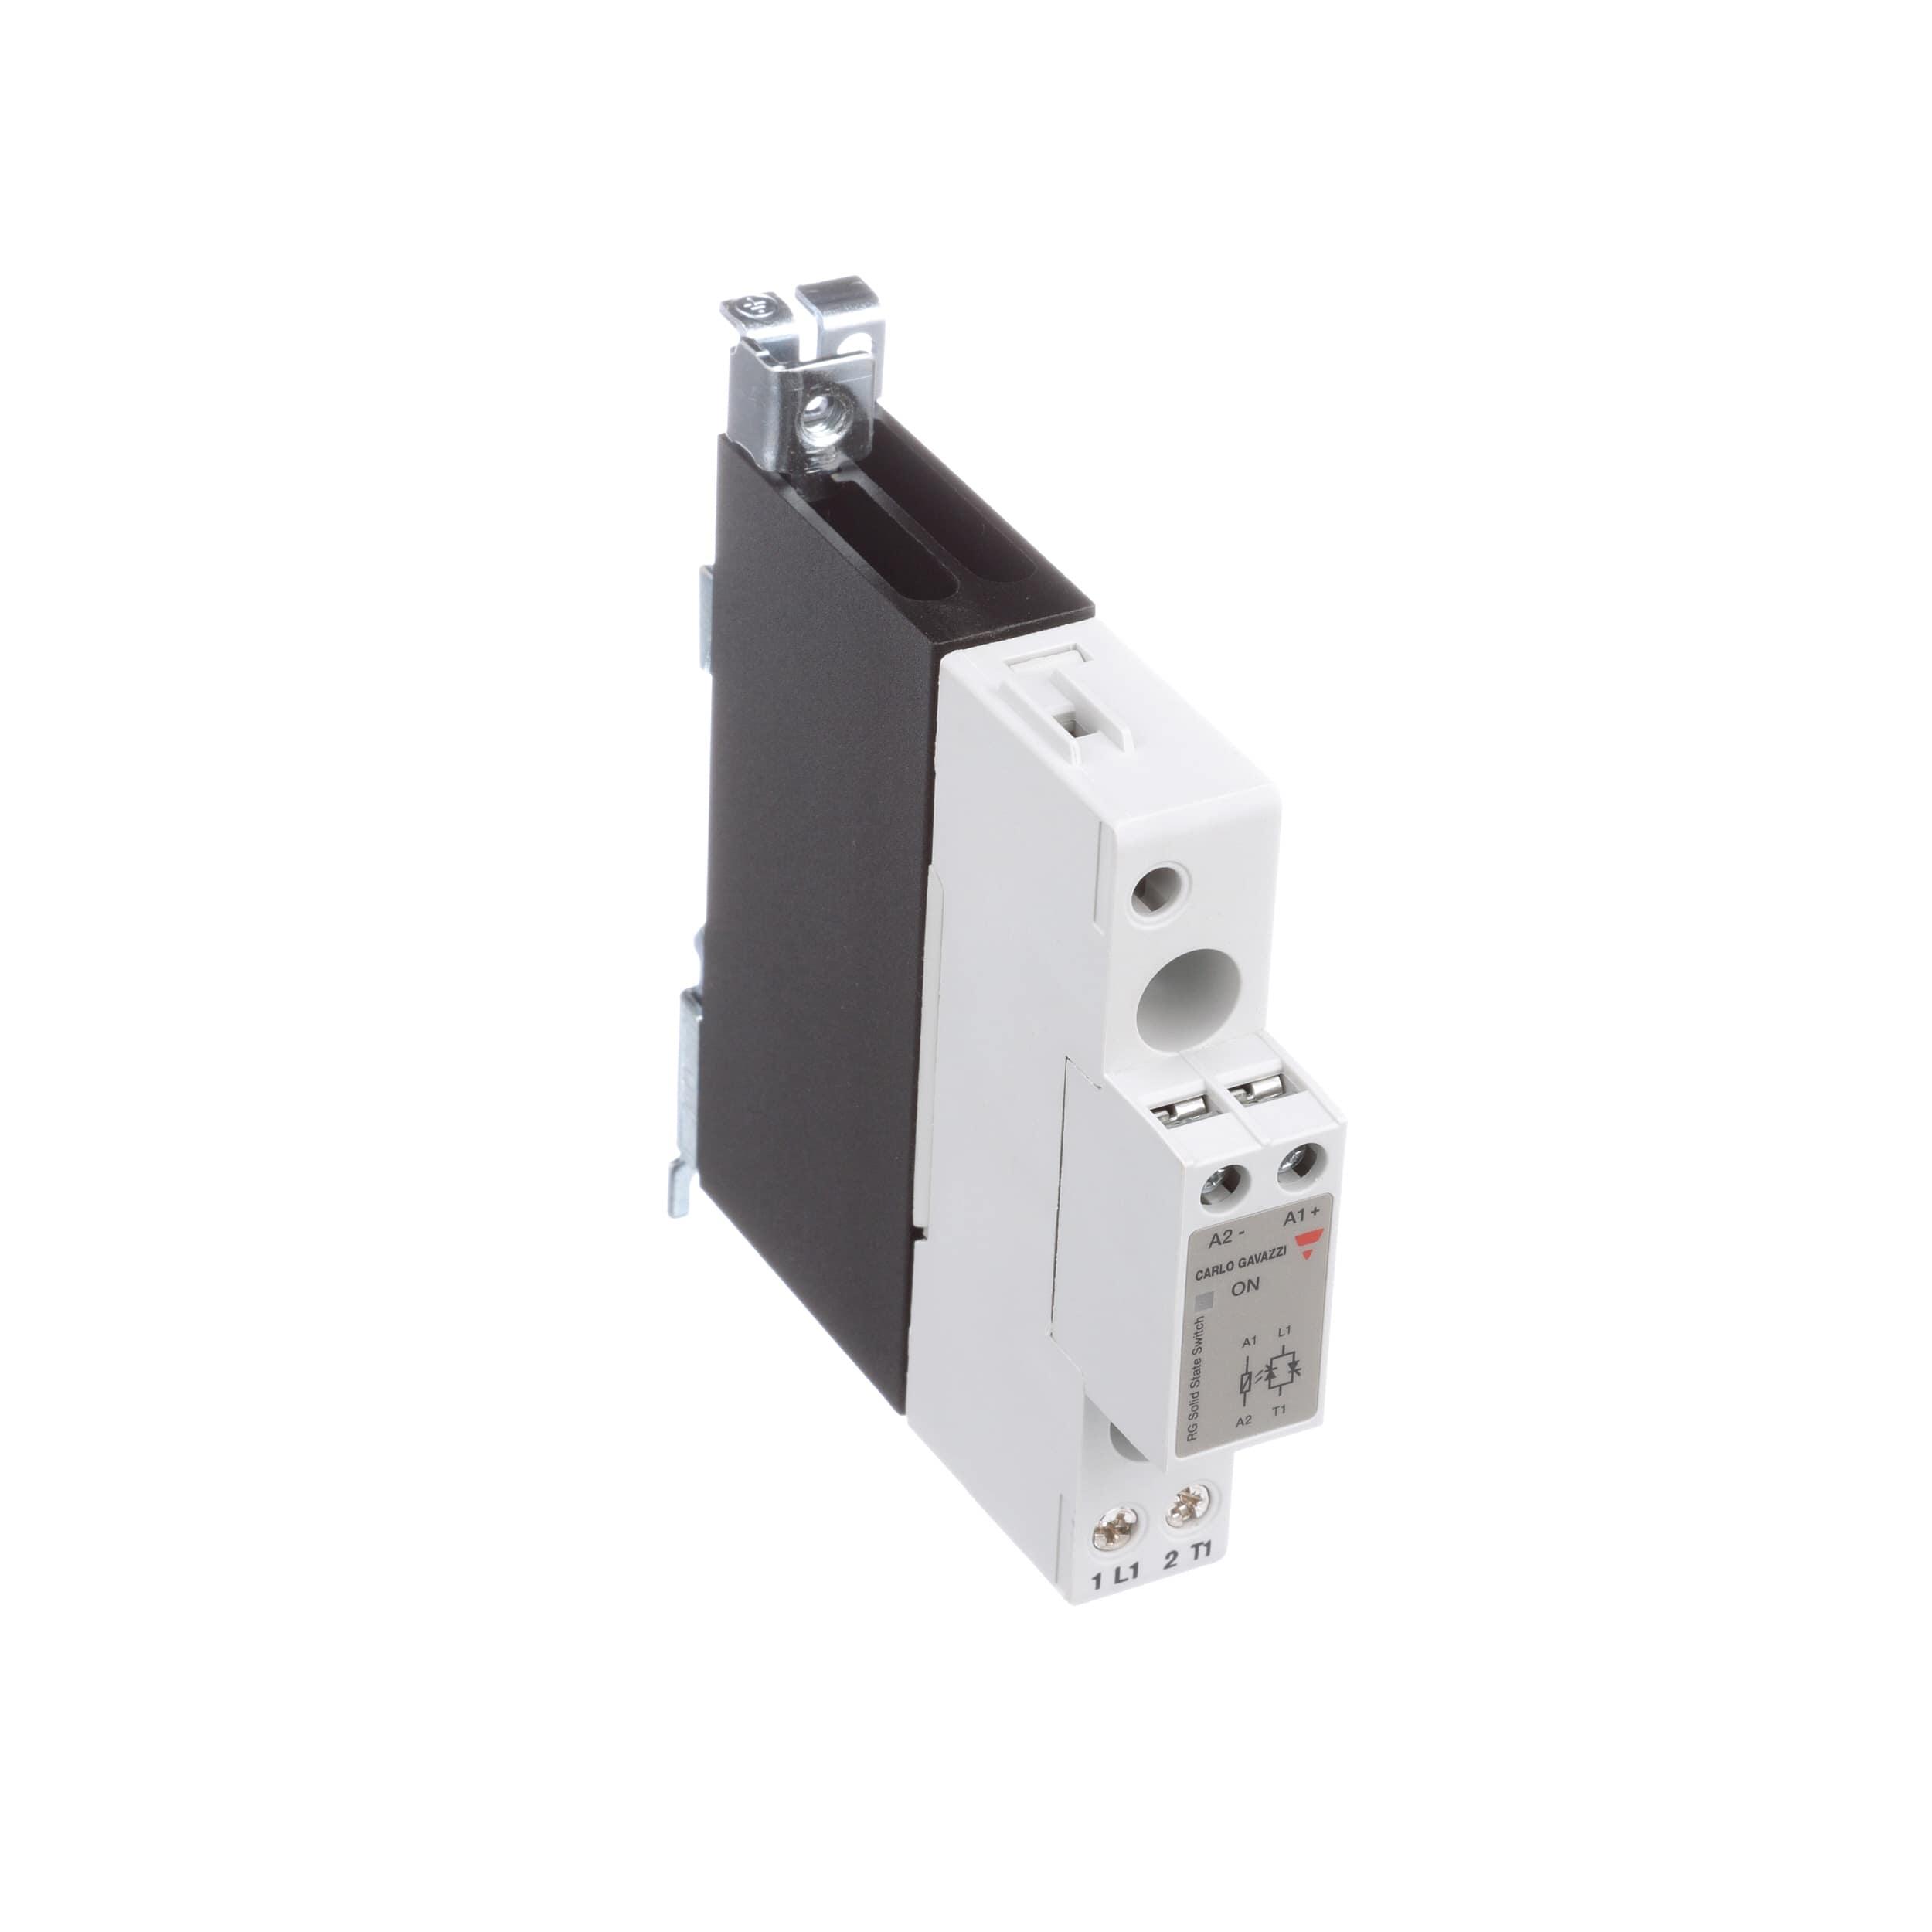 Carlo Gavazzi Inc Rgc1a60d15kgu Contactor Solid State Single Relay Canada Pole 4 32vdc Control 20aac 36 660vac Line Allied Electronics Automation